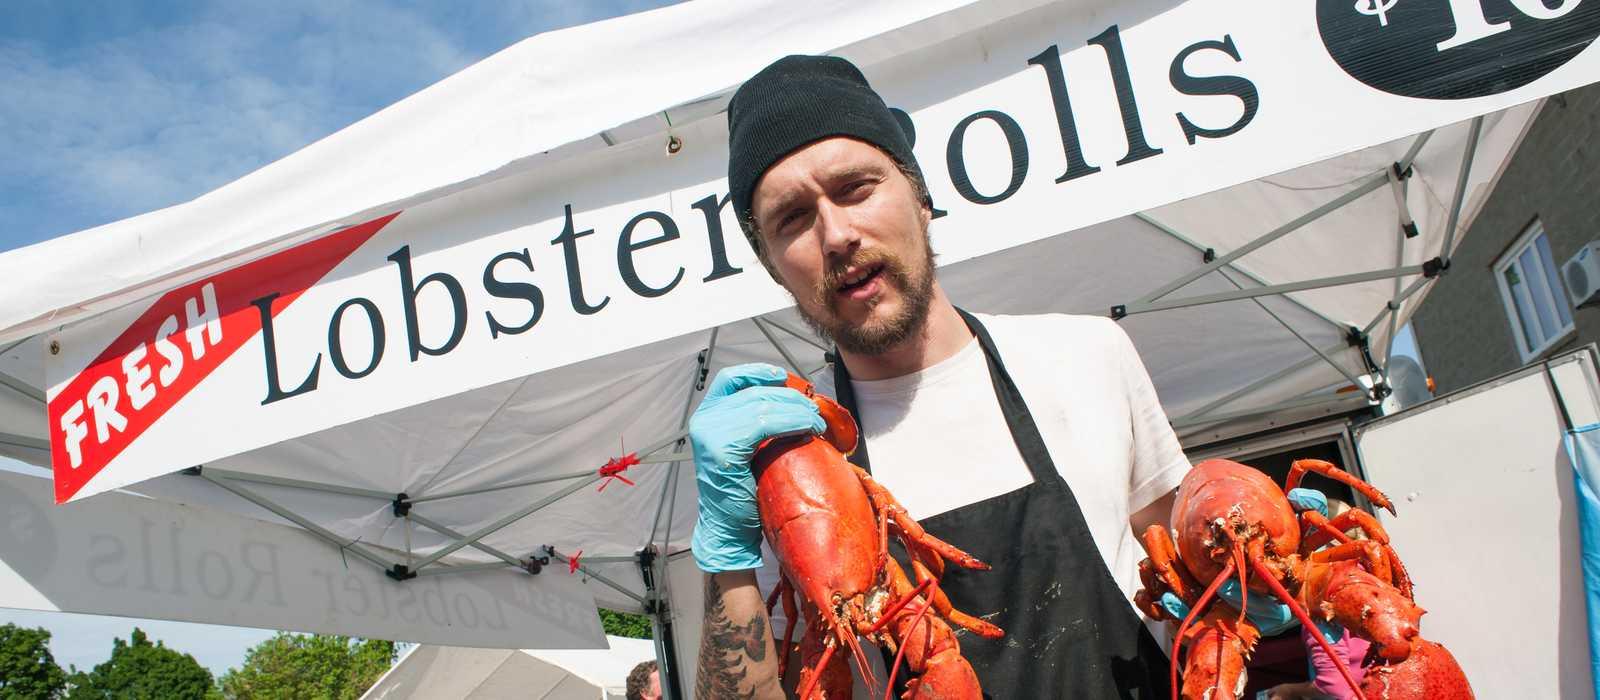 der fangfrische Lobster